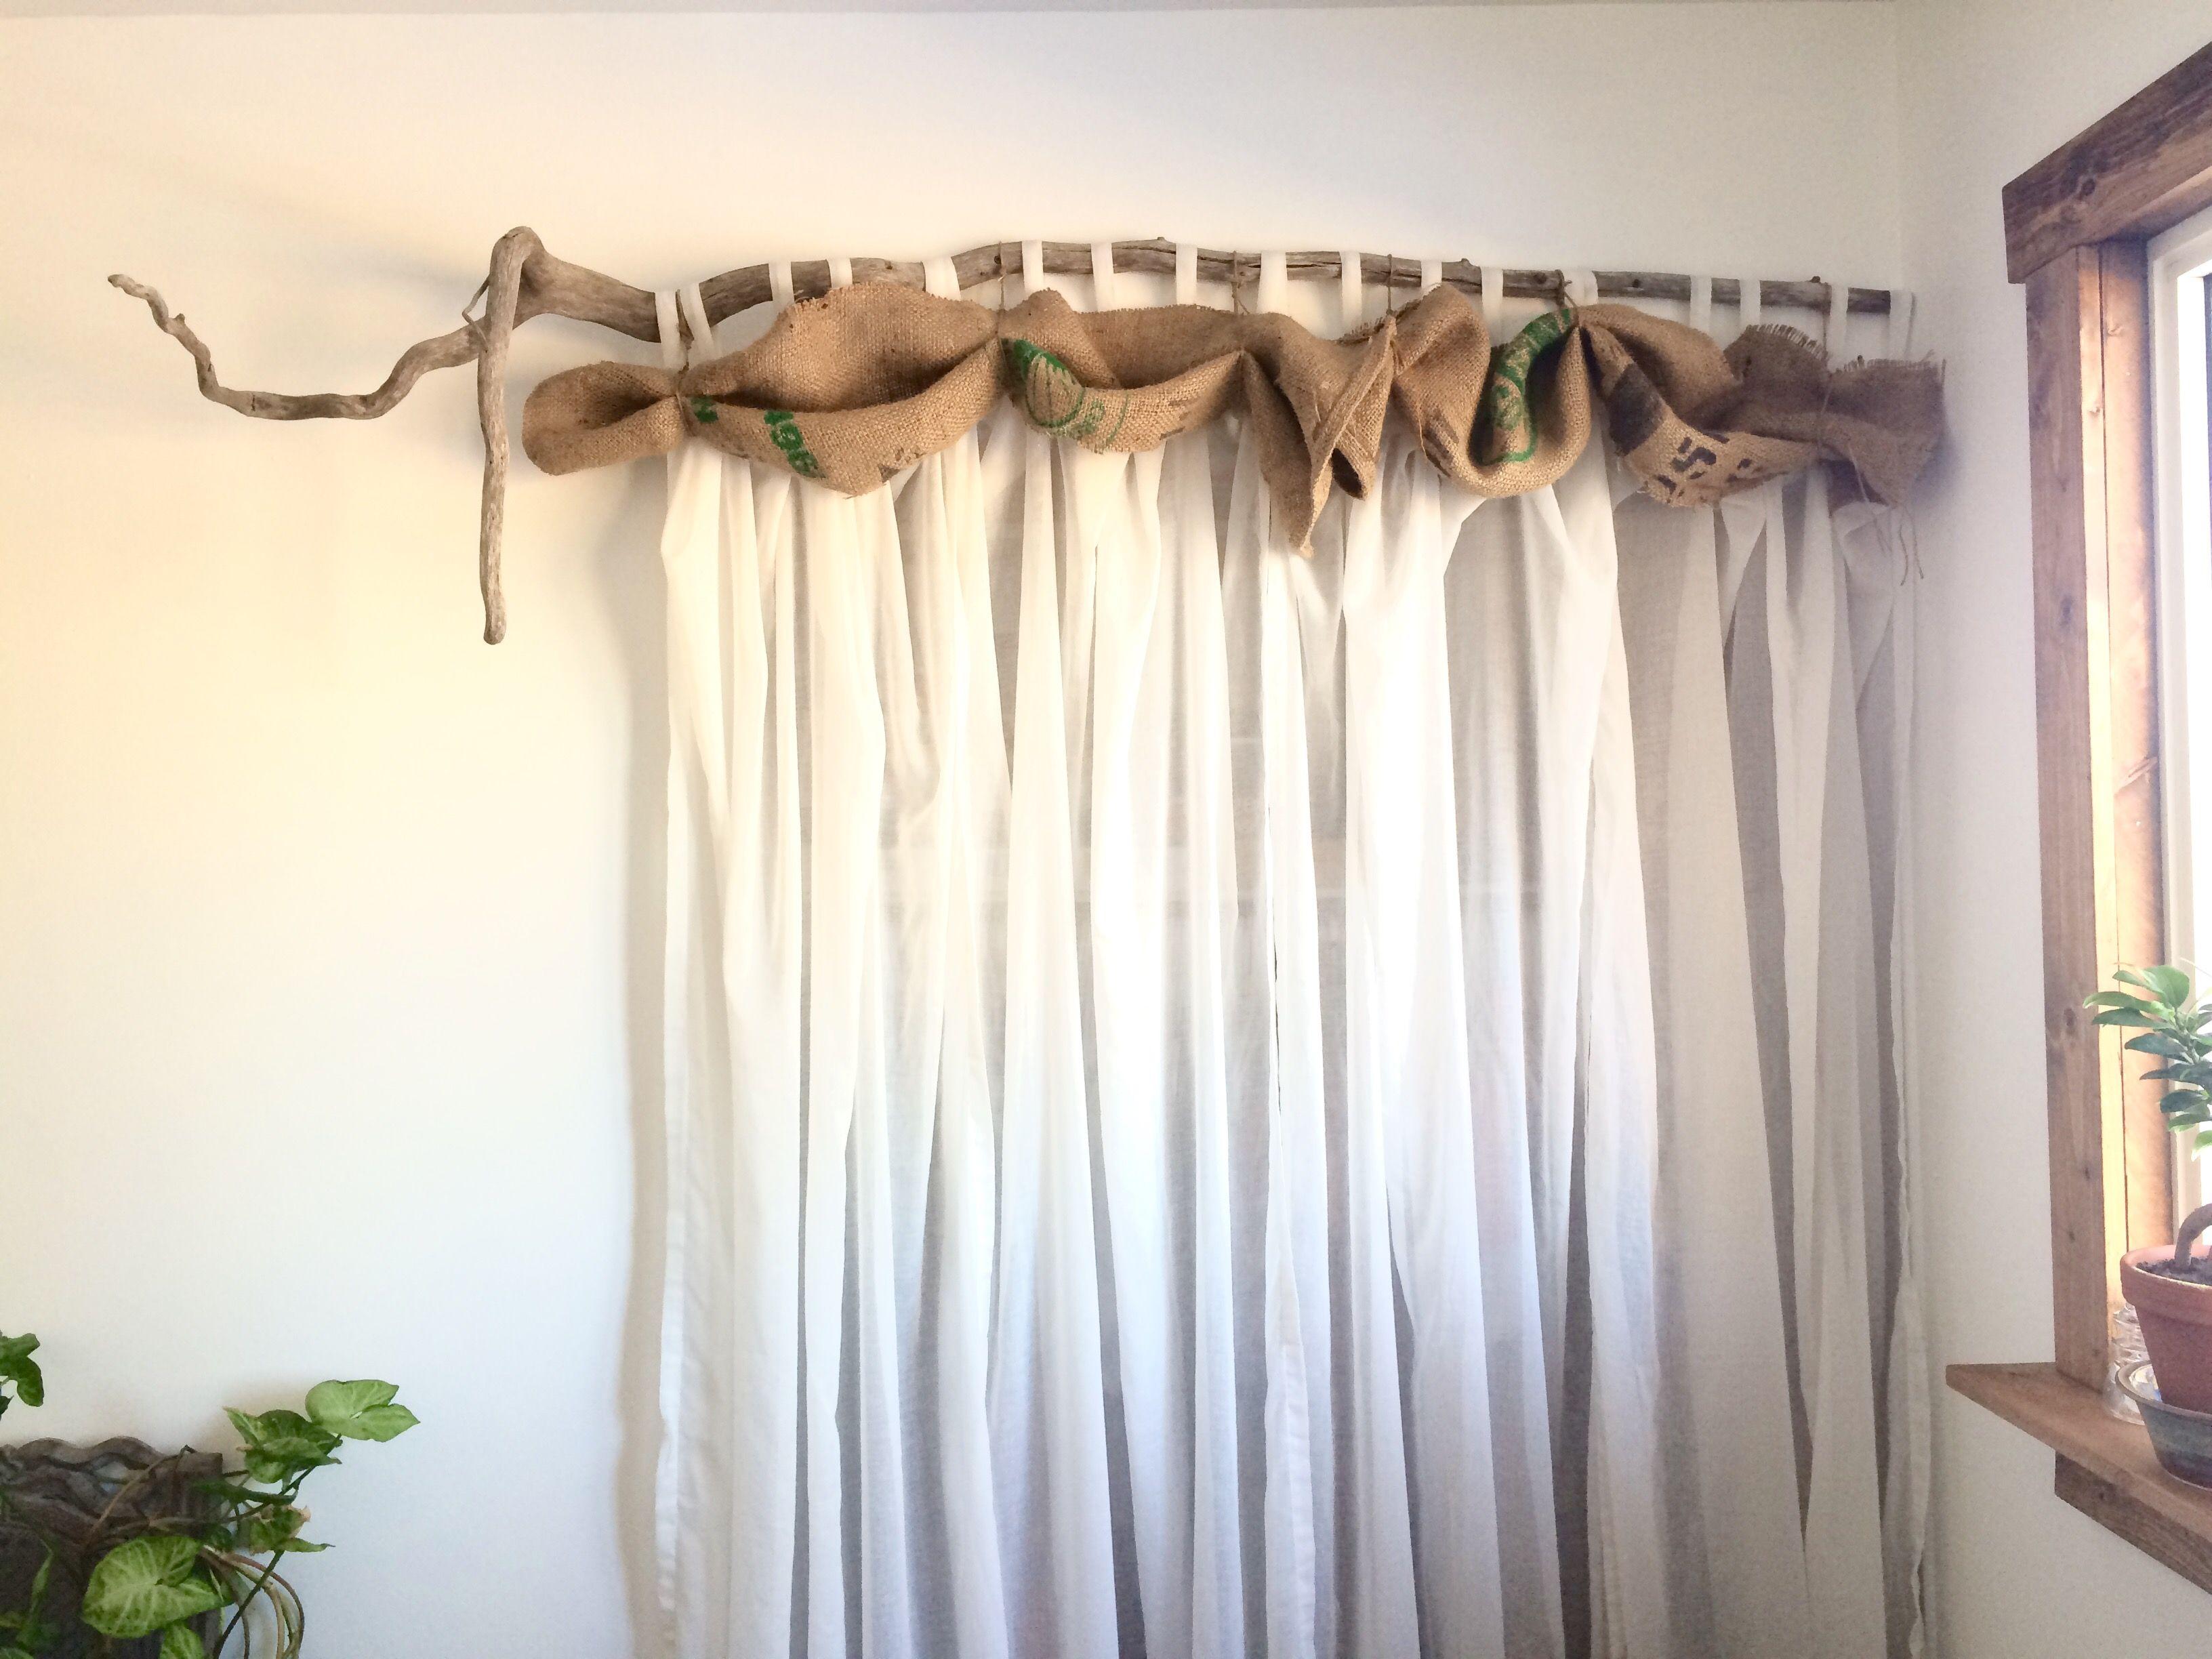 Driftwood Curtain Rod